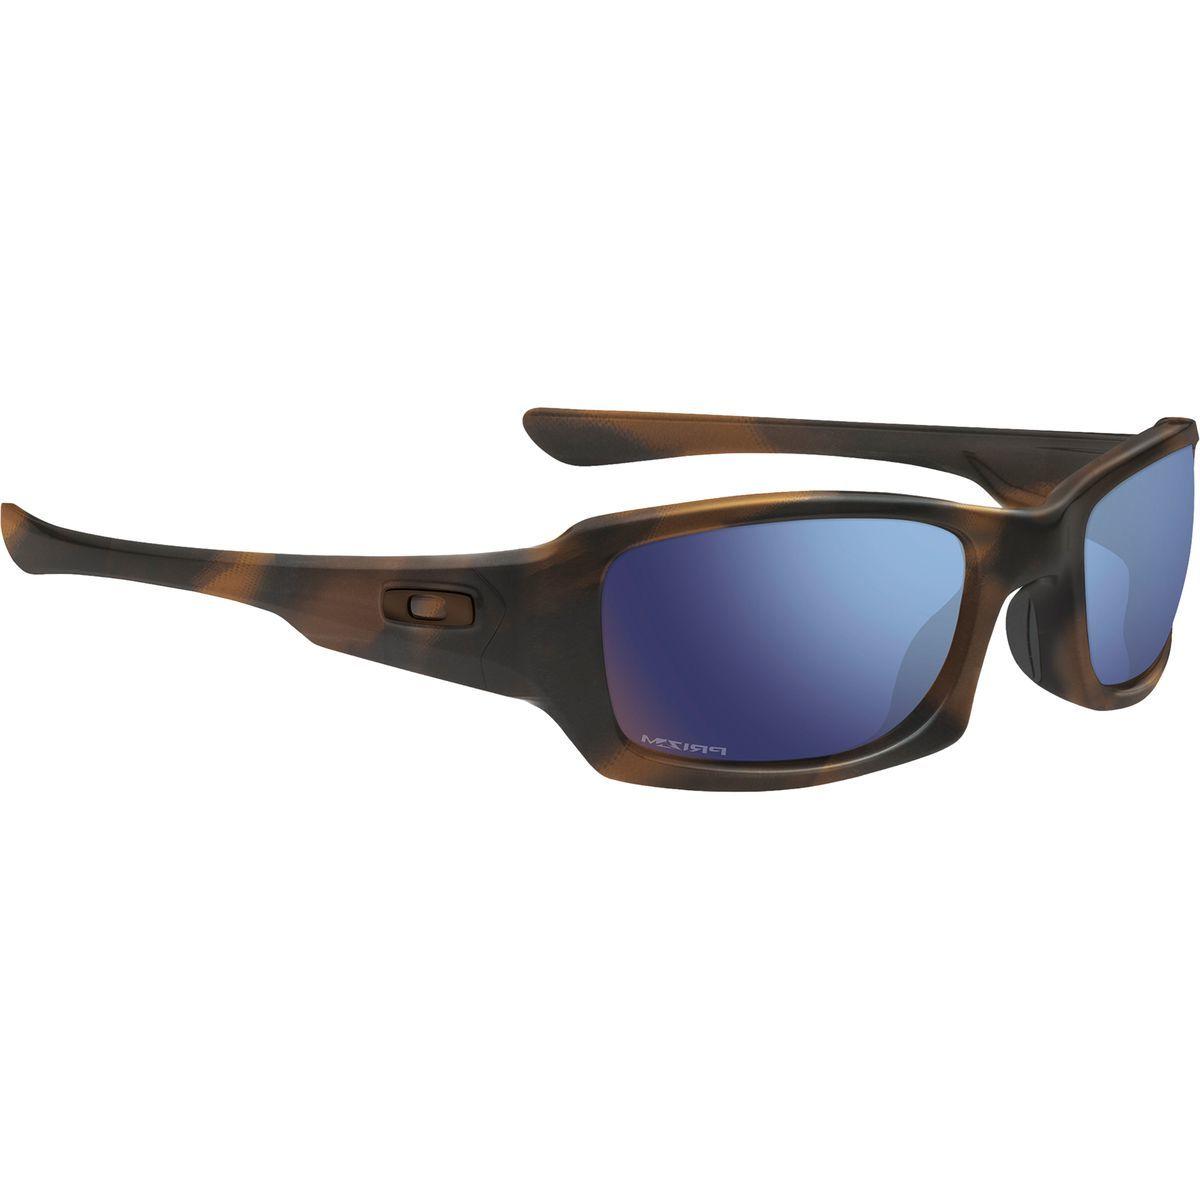 Oakley Fives Squared Prizm Sunglasses - Men's